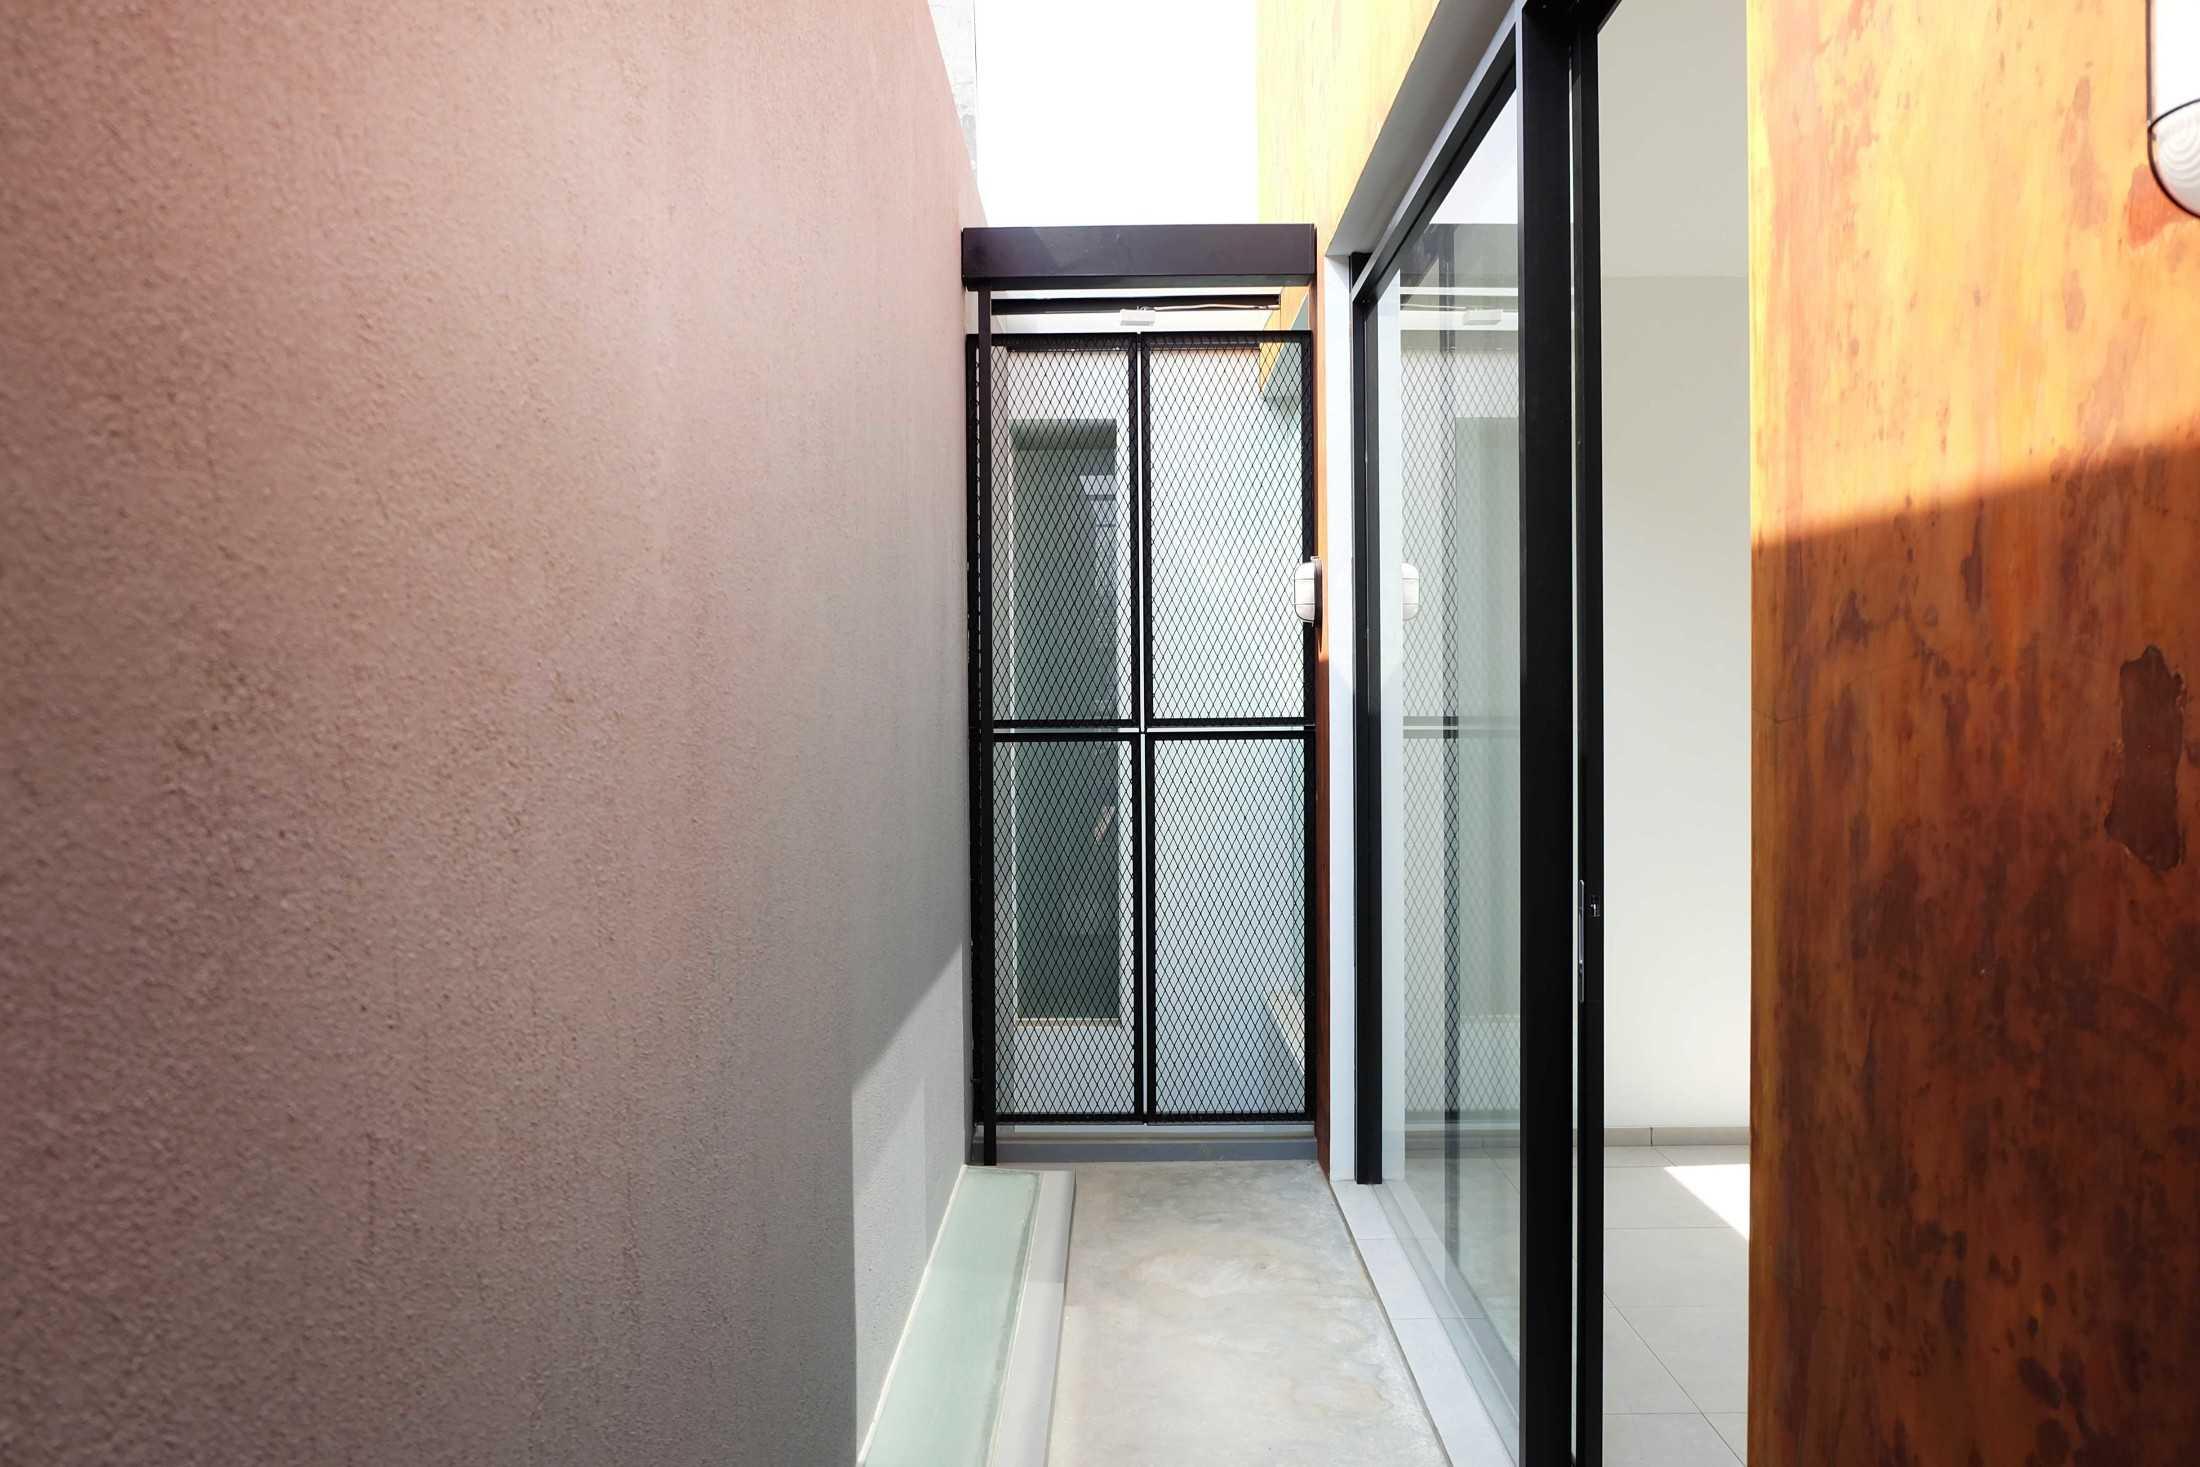 Dica Selaras 105 House Antapani, Kota Bandung, Jawa Barat, Indonesia Antapani, Kota Bandung, Jawa Barat, Indonesia Dica-Selaras-105-House  62322